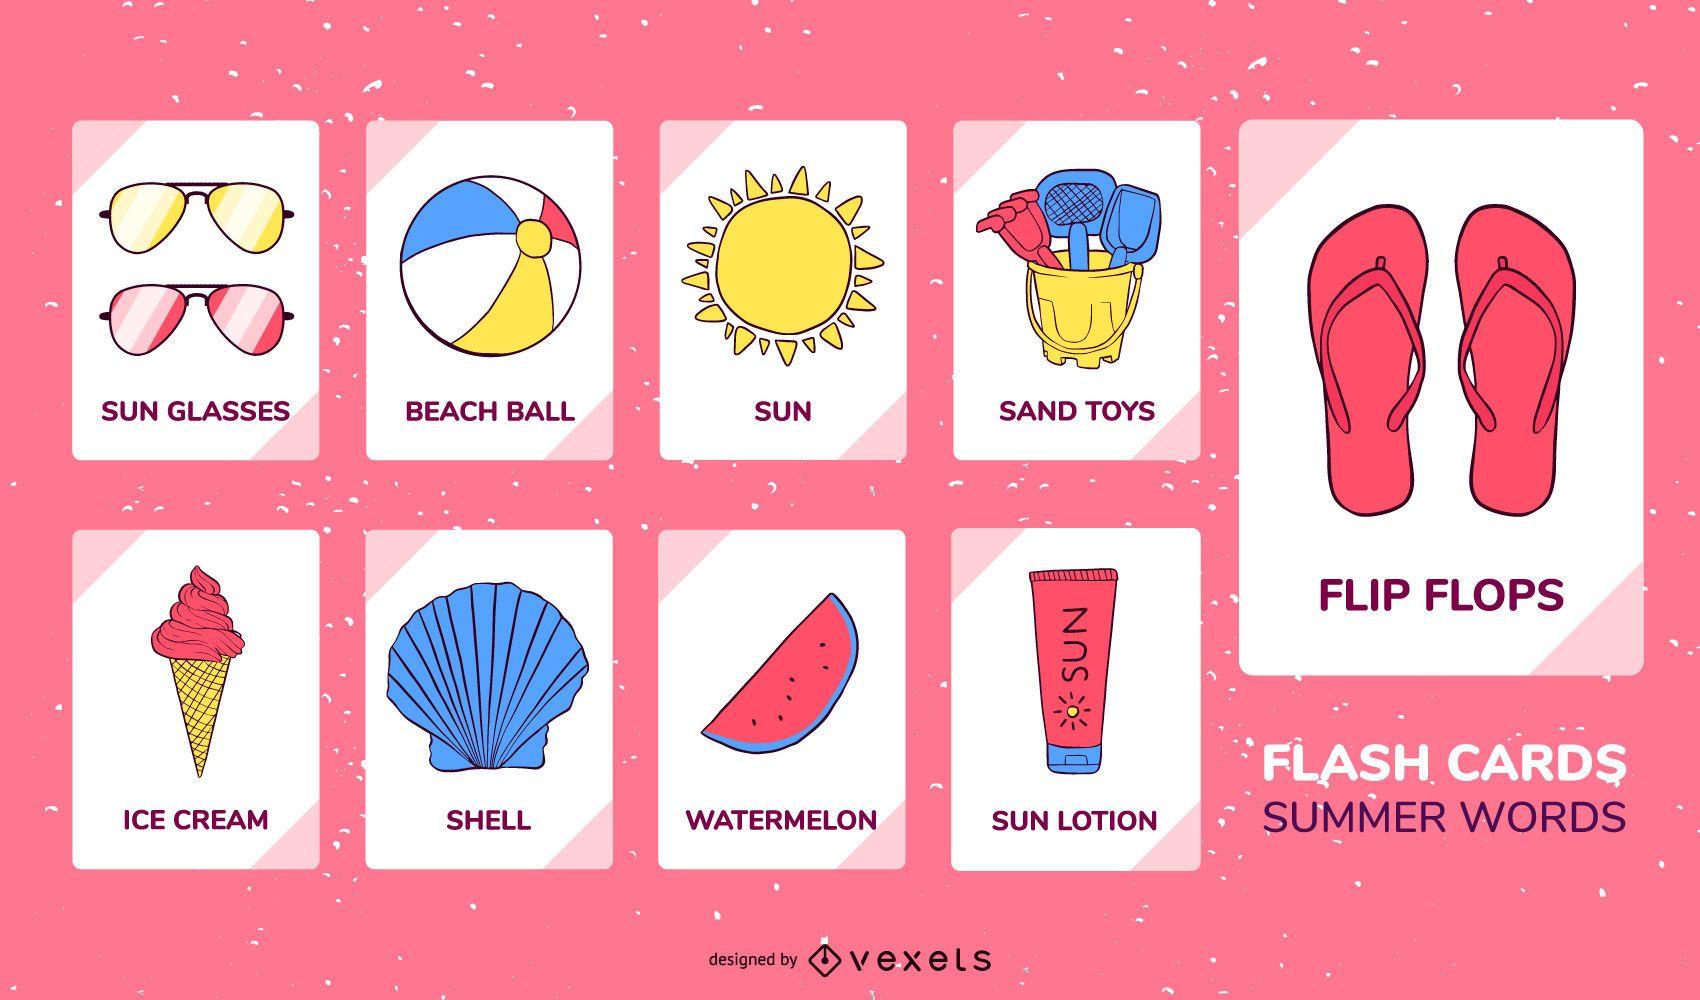 Summer elements flashcard set